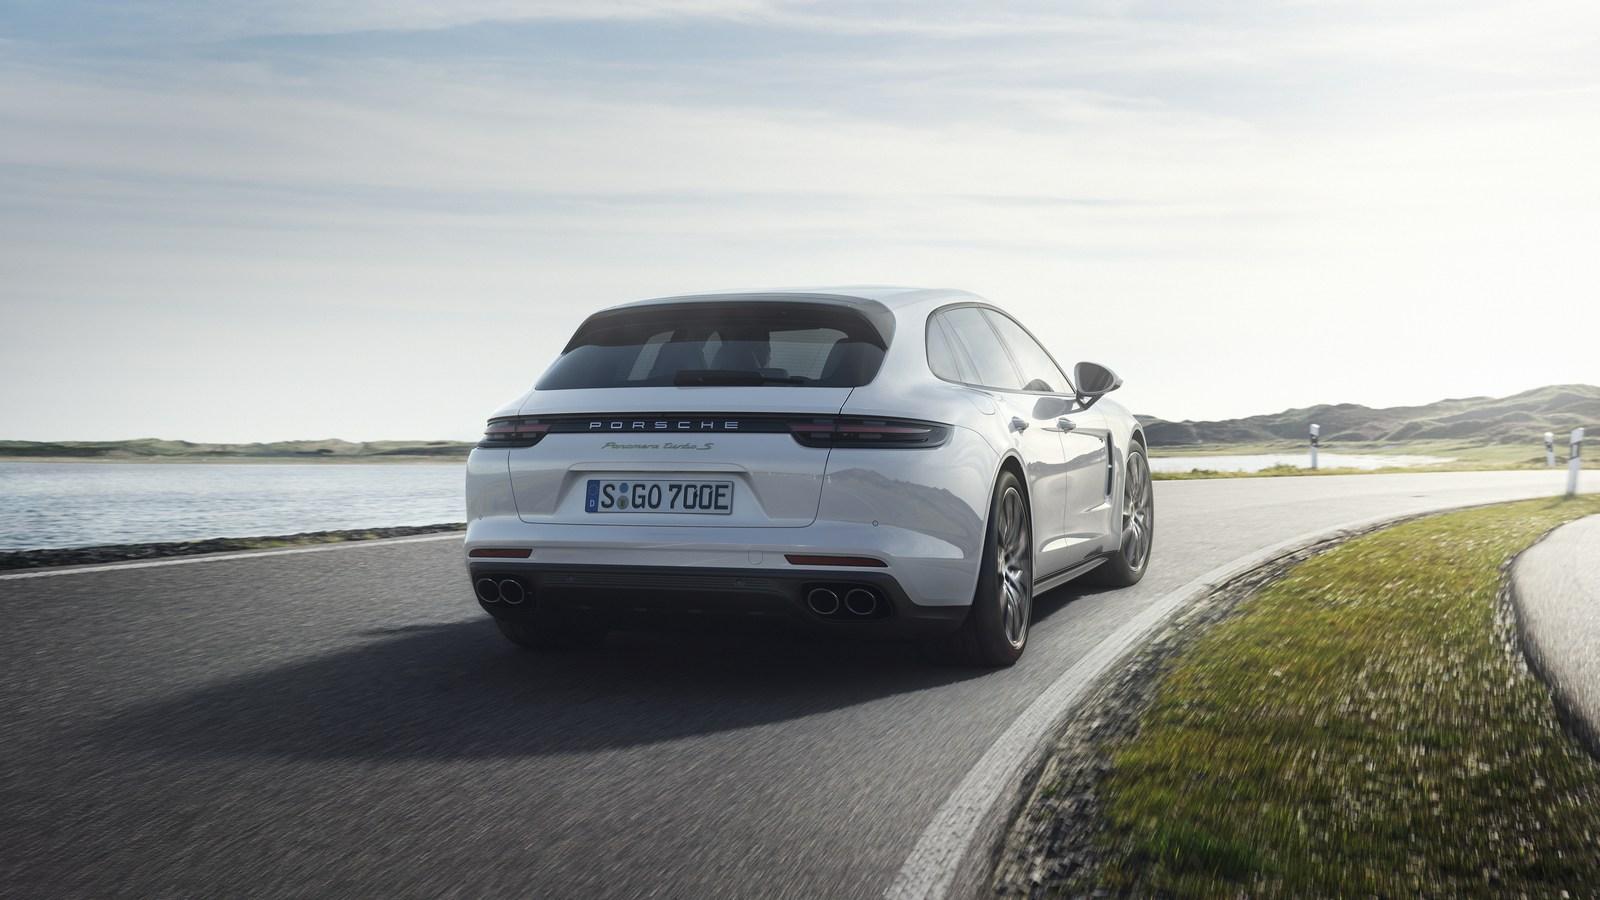 Porsche-Panamera-Turbo-S-E-Hybrid-Sport-Turismo-3